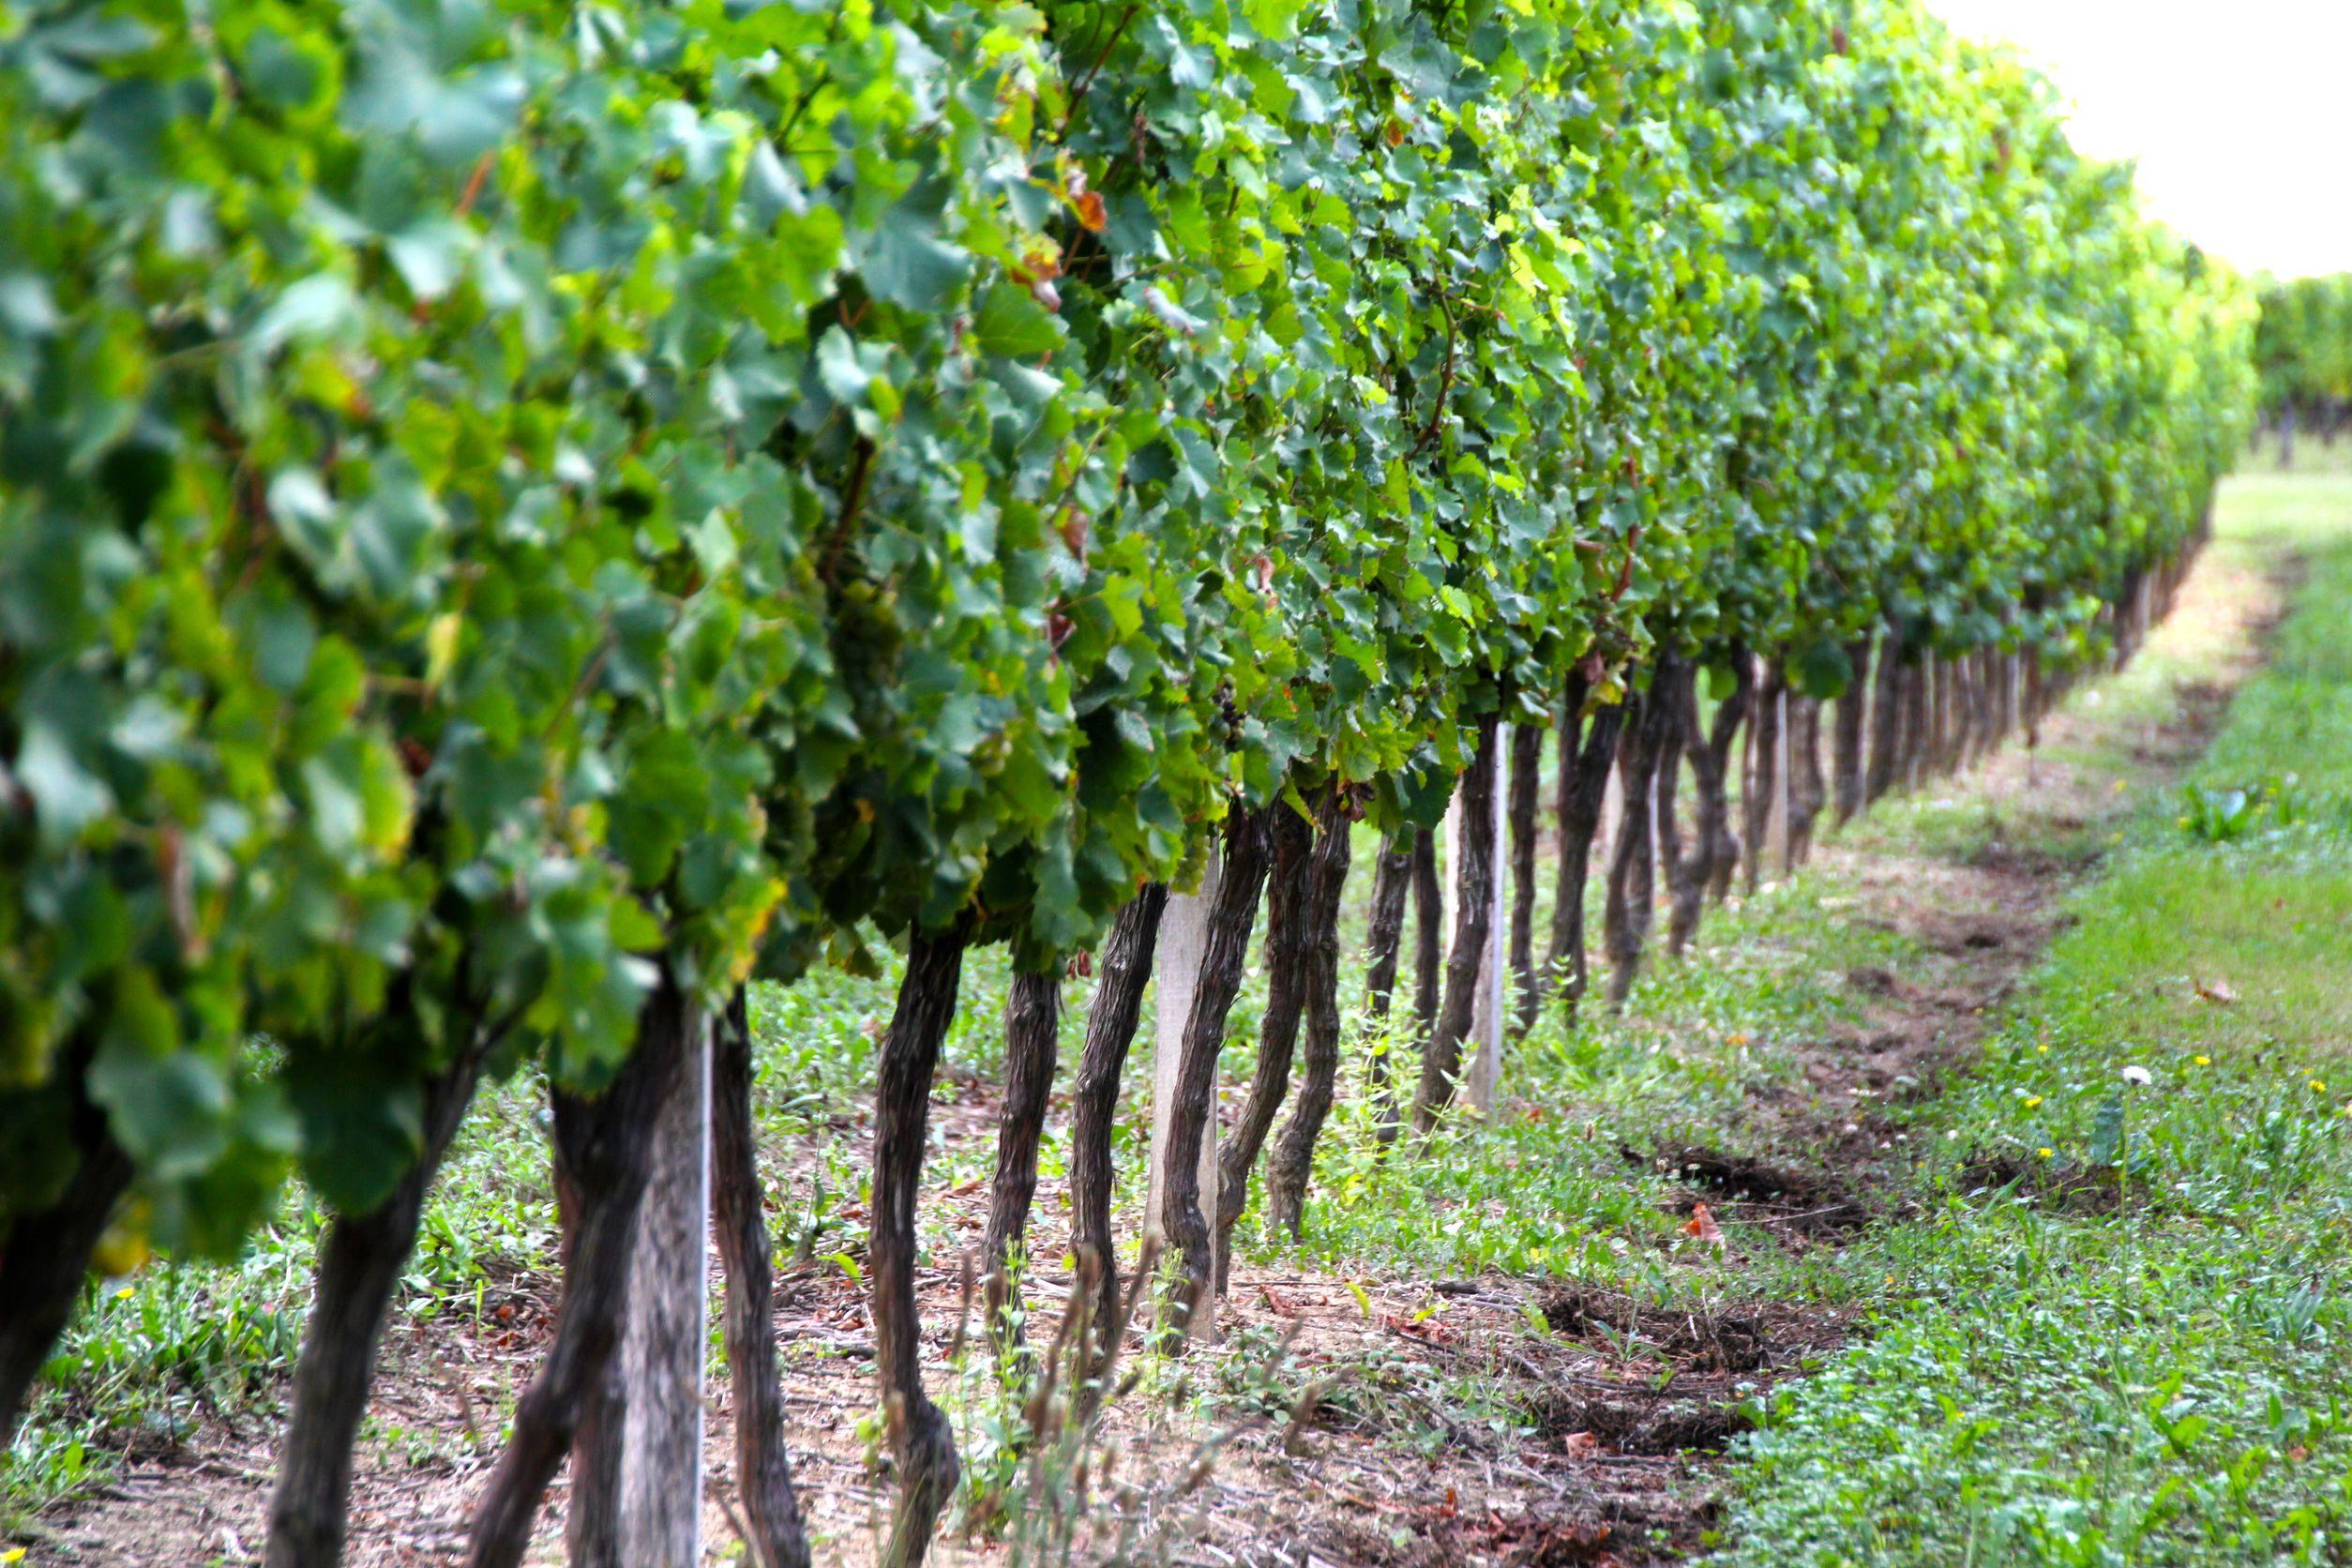 australia wine and grapes 123rf